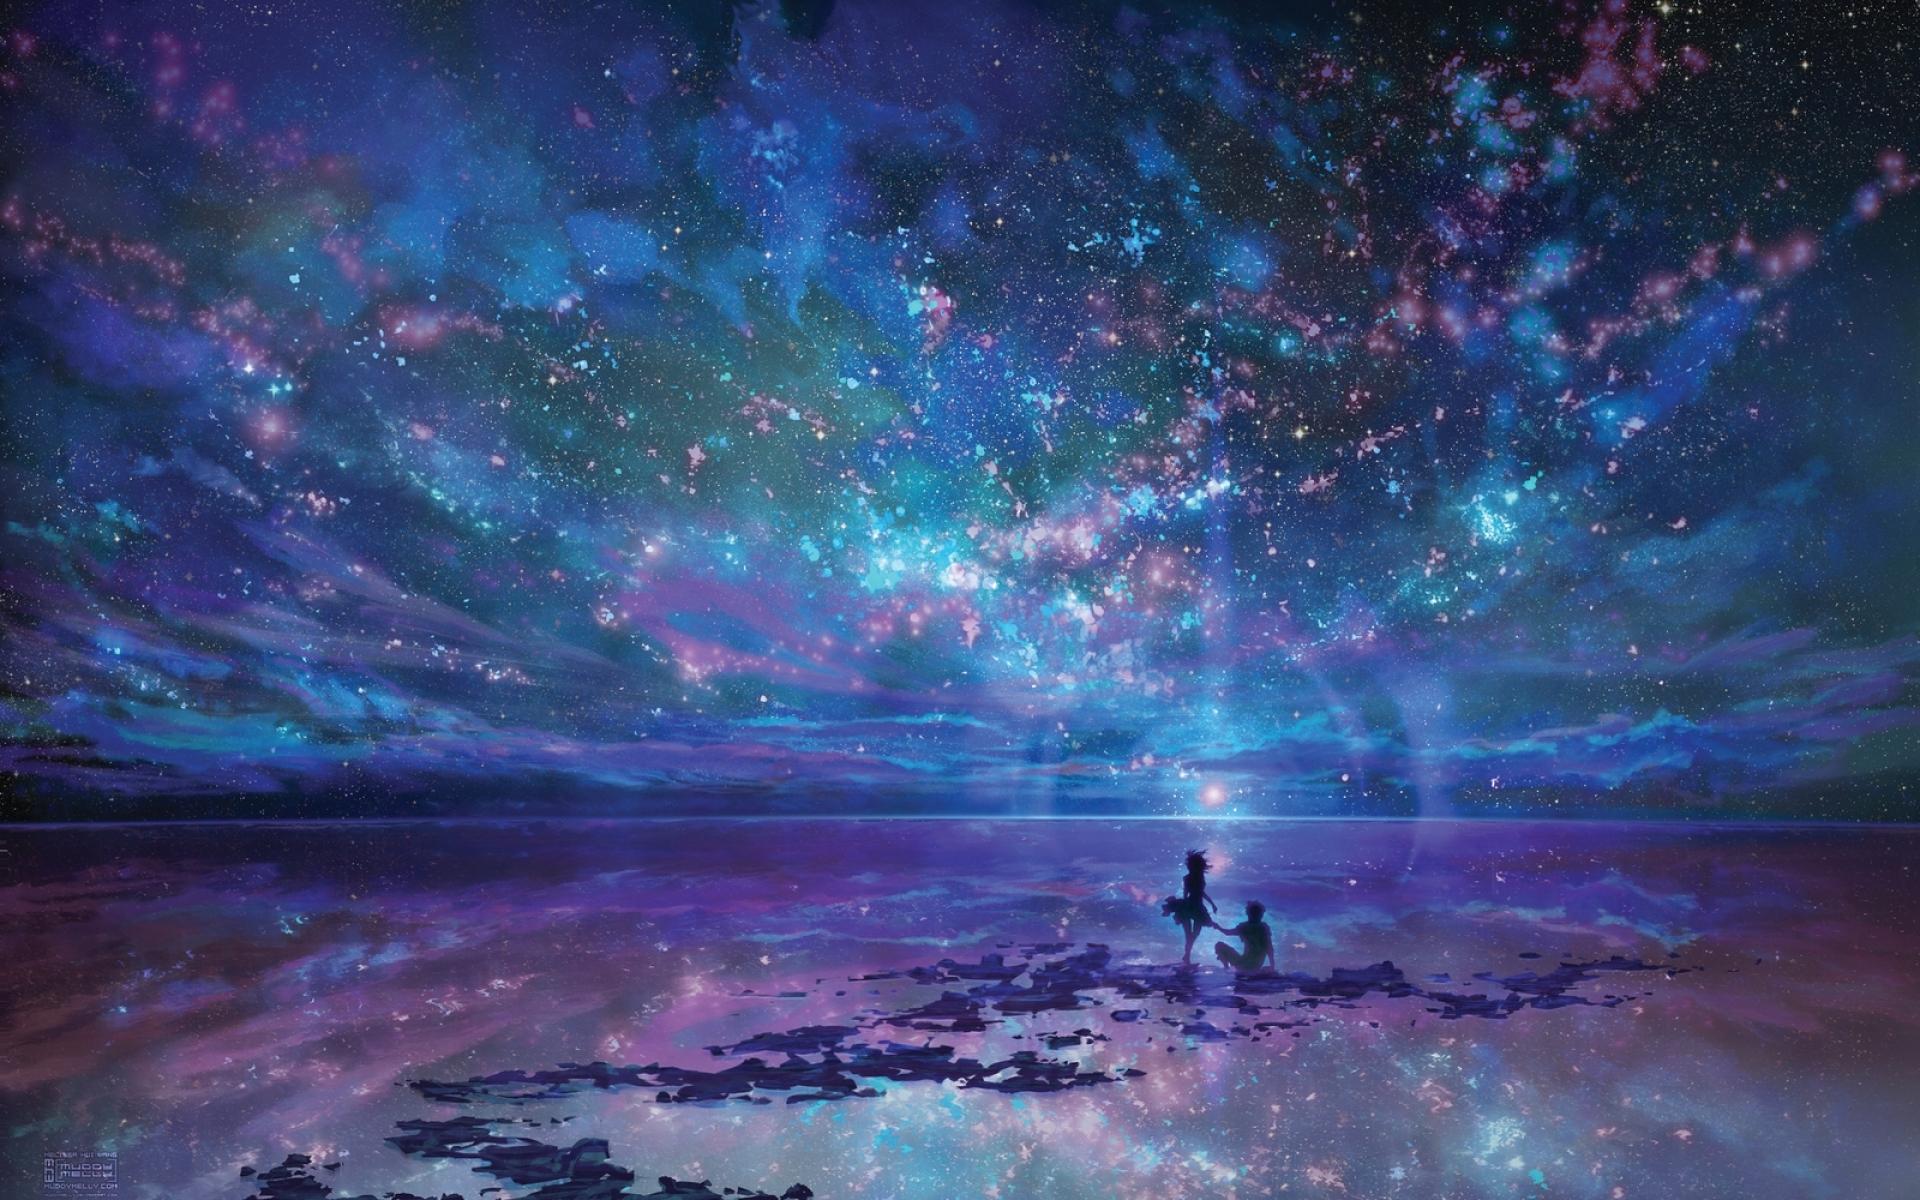 Night Stars Ocean Couple HD Desktop wallpaper images and photos 1920x1200